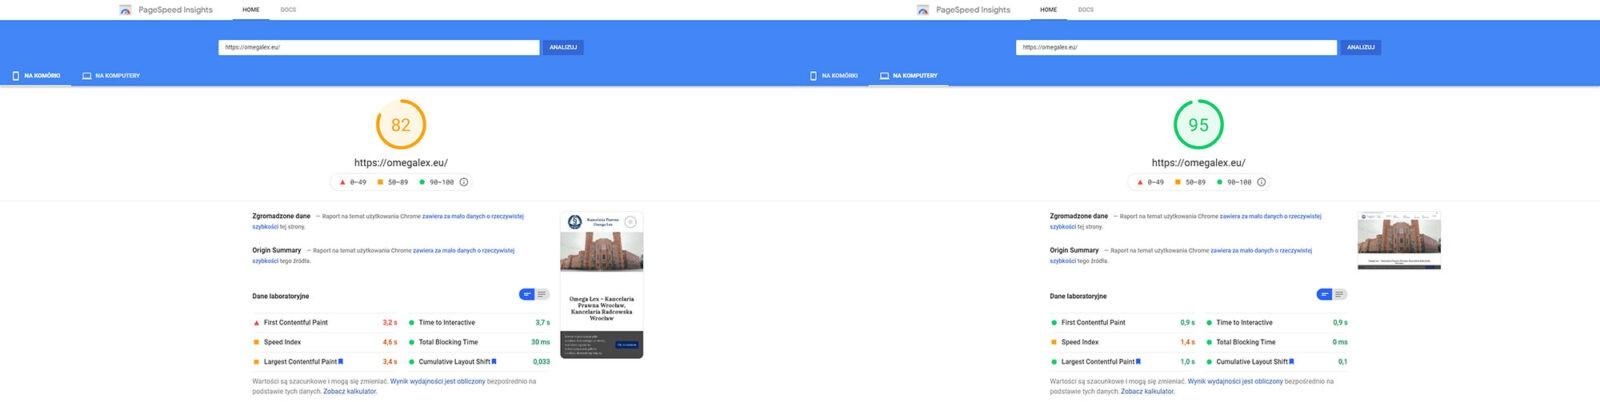 Wyniki Google PageSpeed Insights